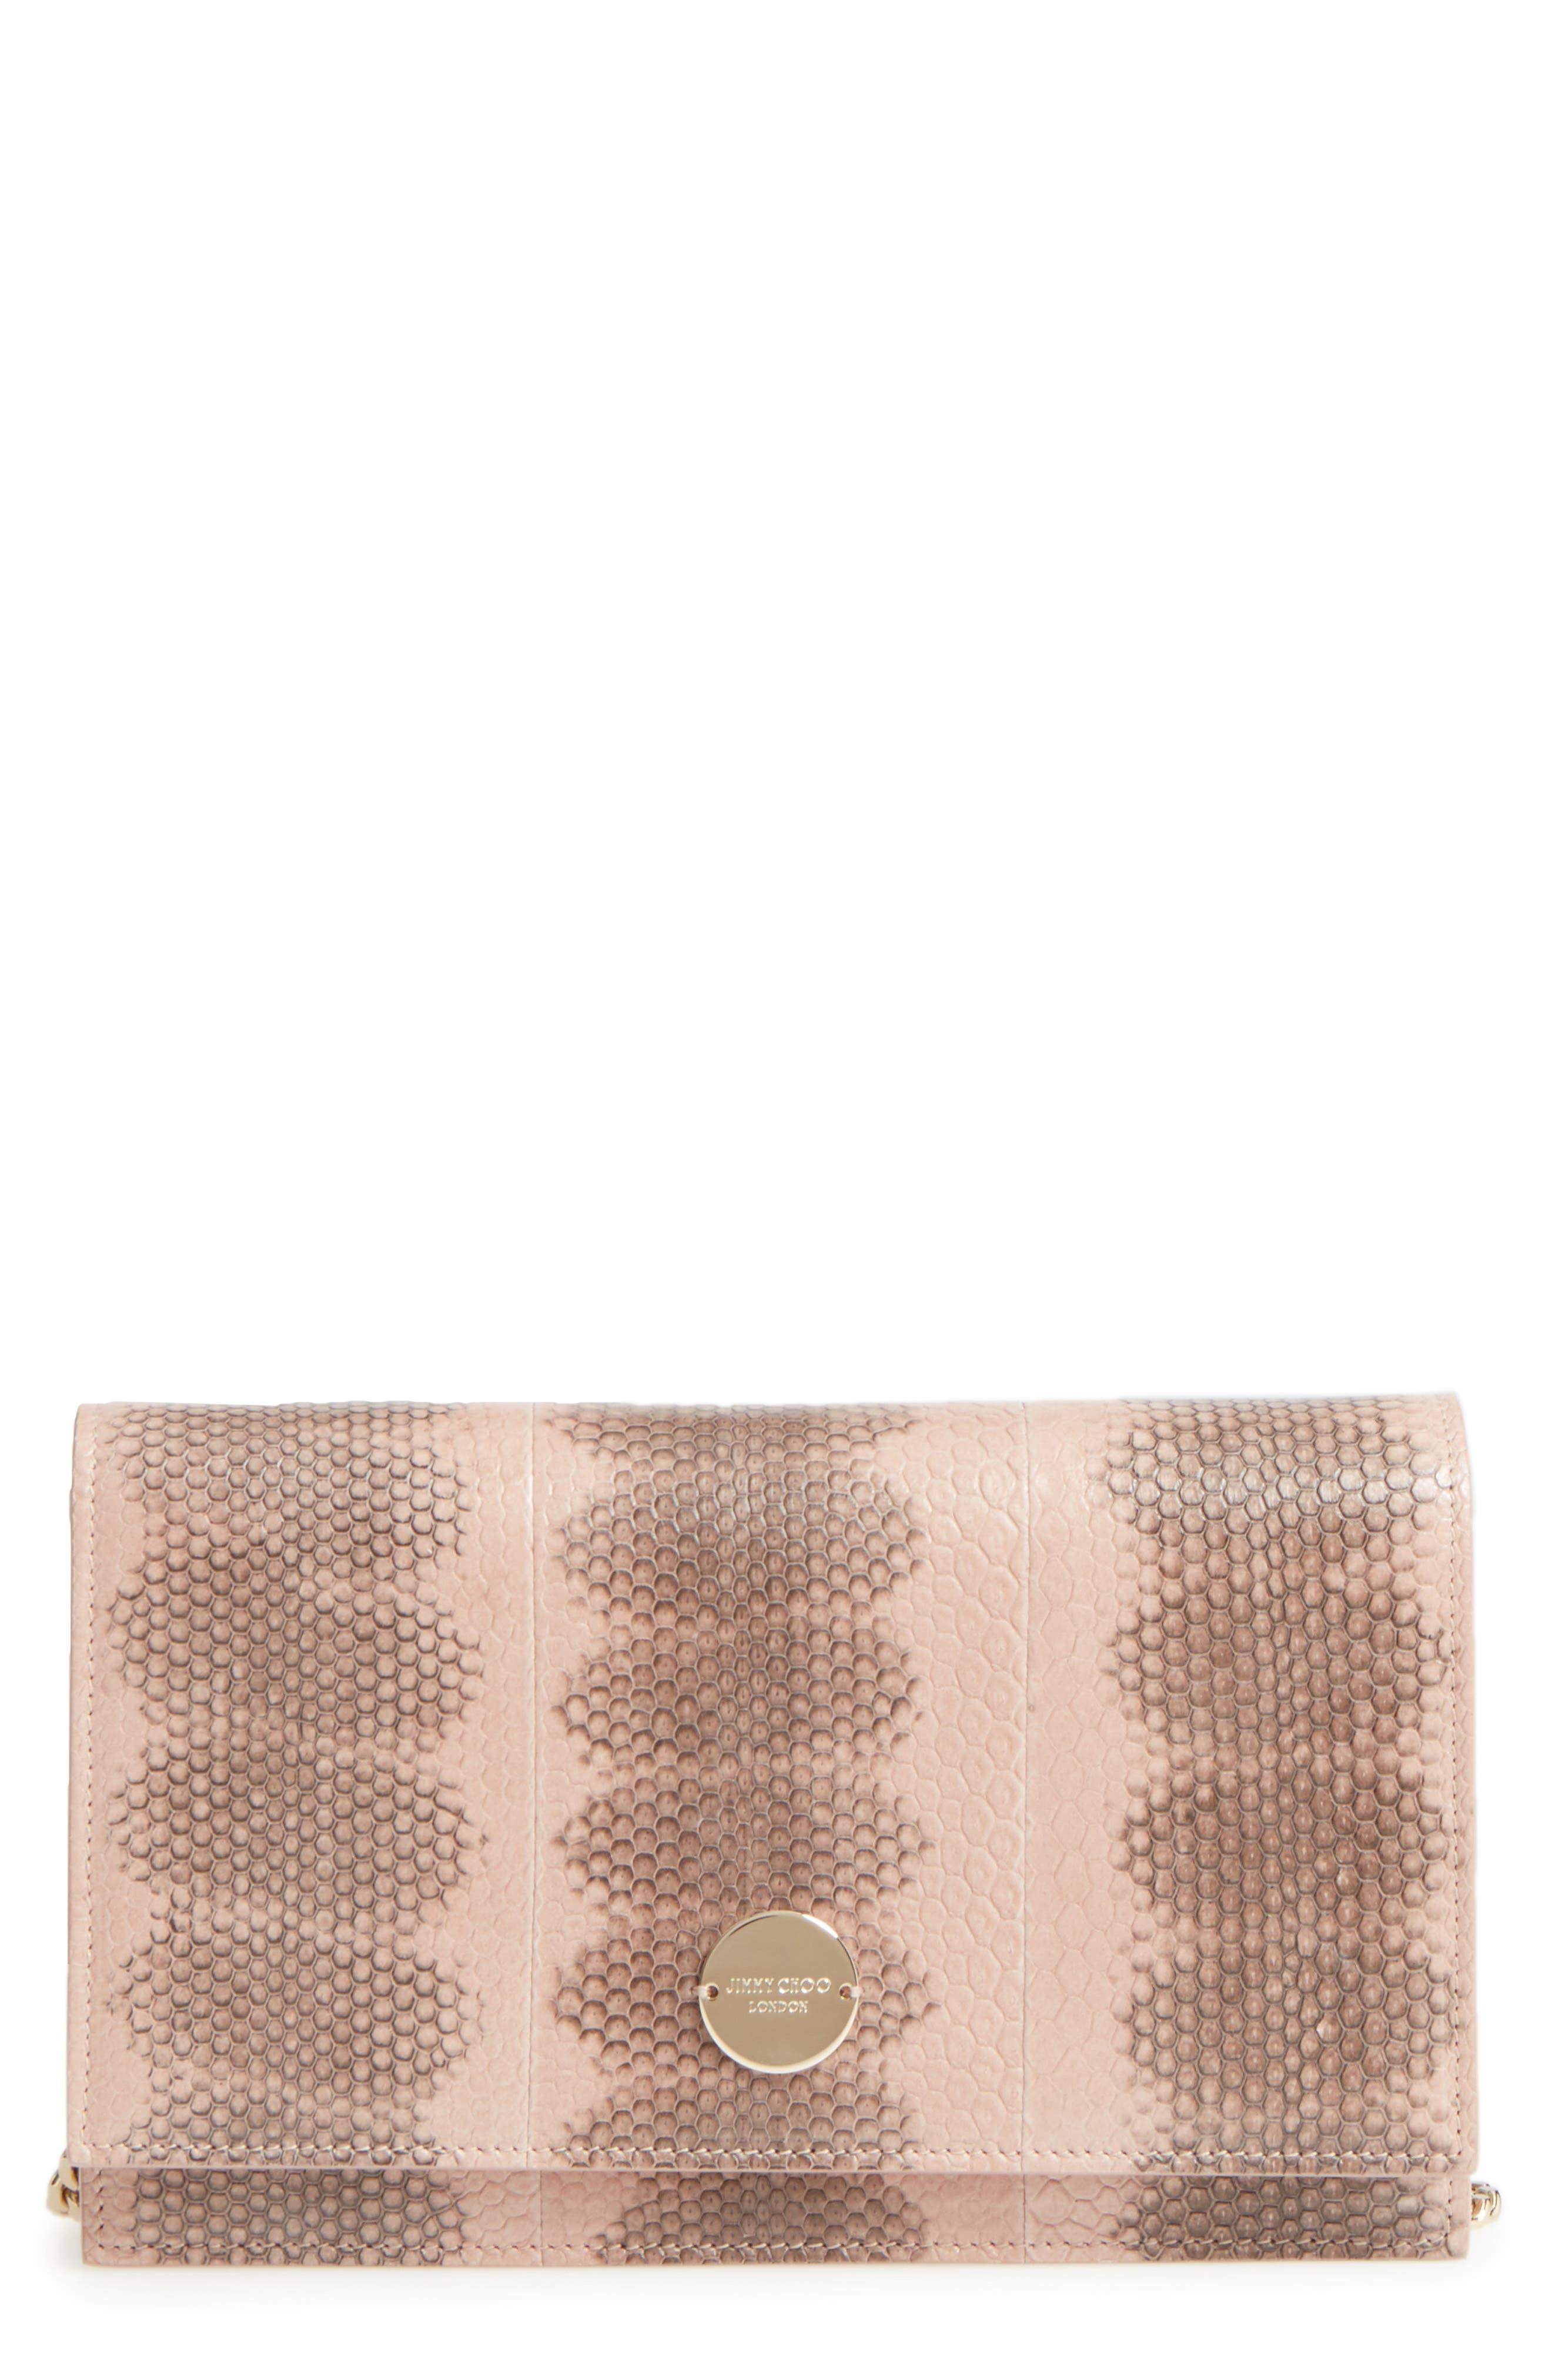 Jimmy Choo Florence Genuine Snakeskin Crossbody Bag